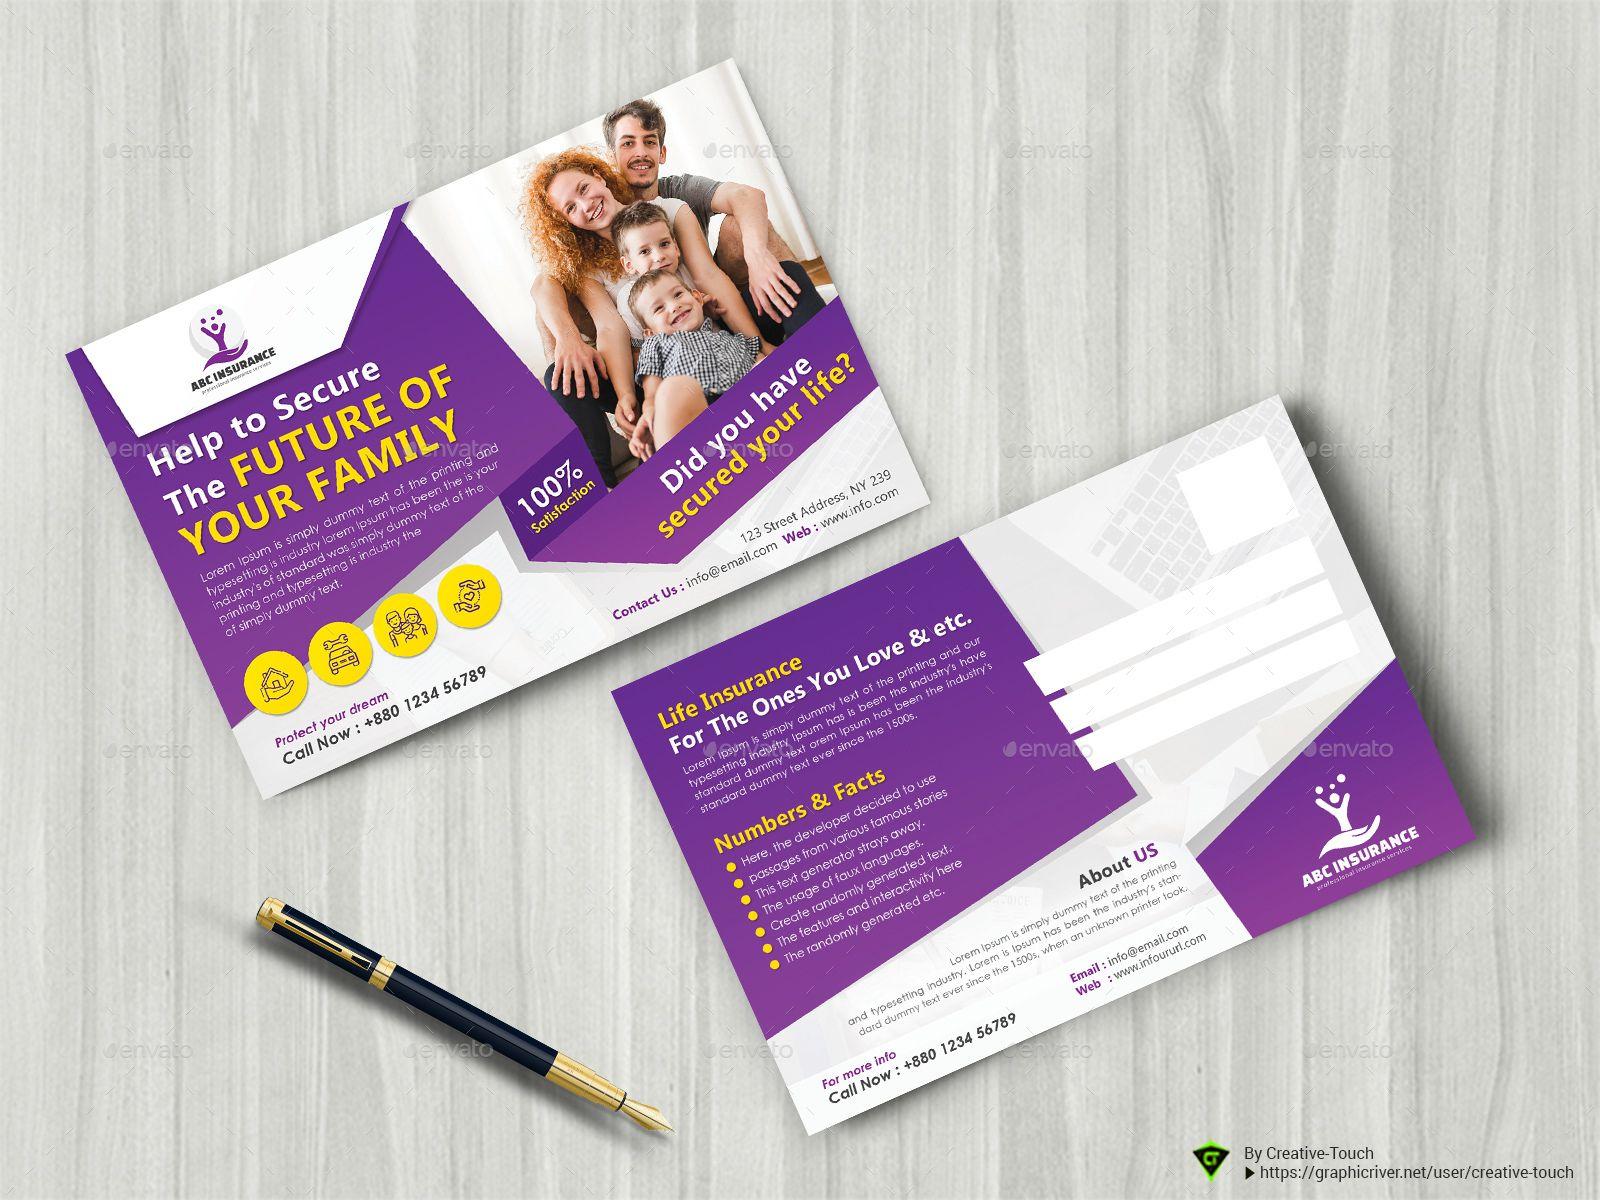 Insurance Business Marketing Postcard Marketing Postcard